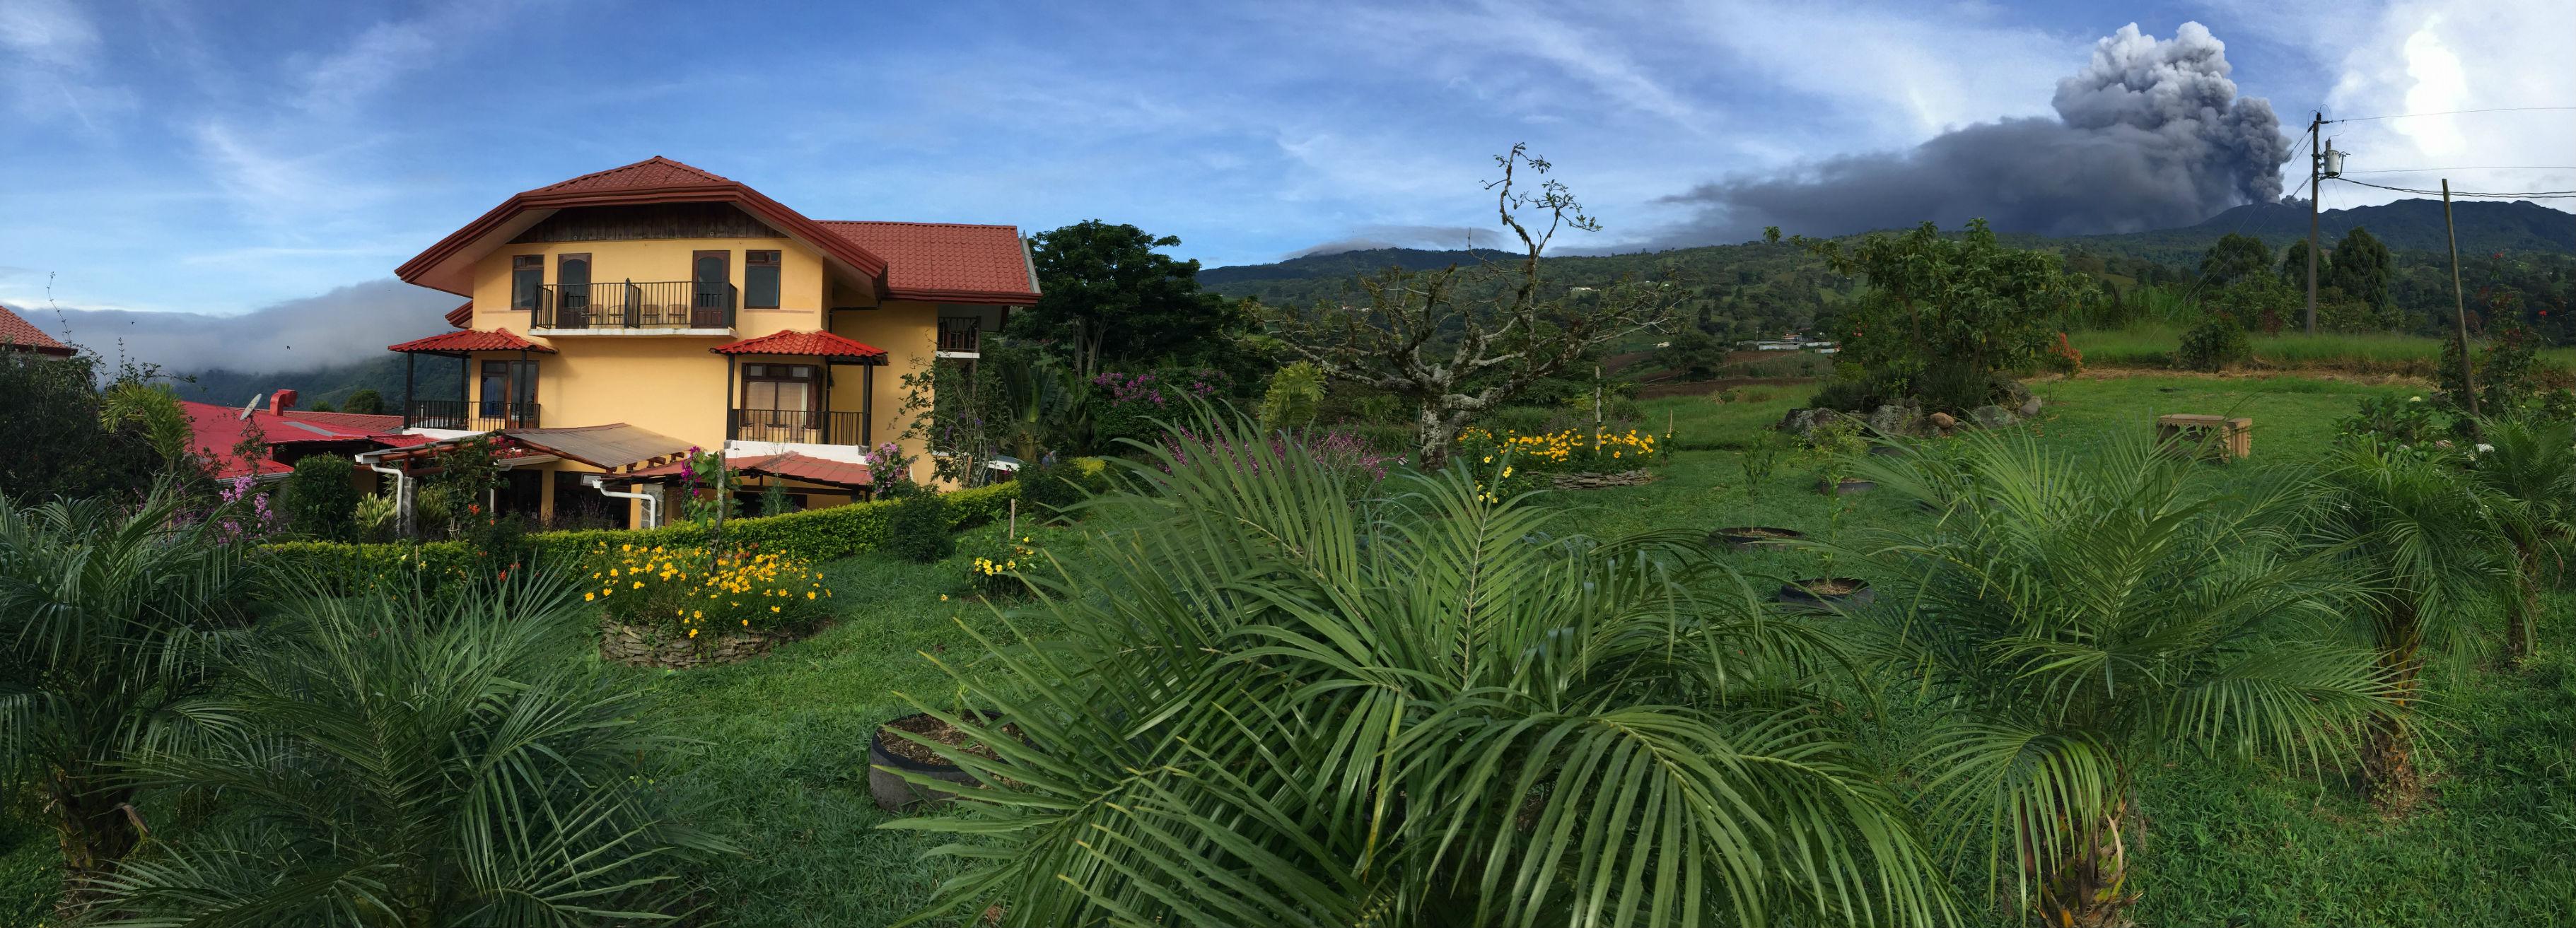 Turrialba Volcano erupting at Guayabo Lodge